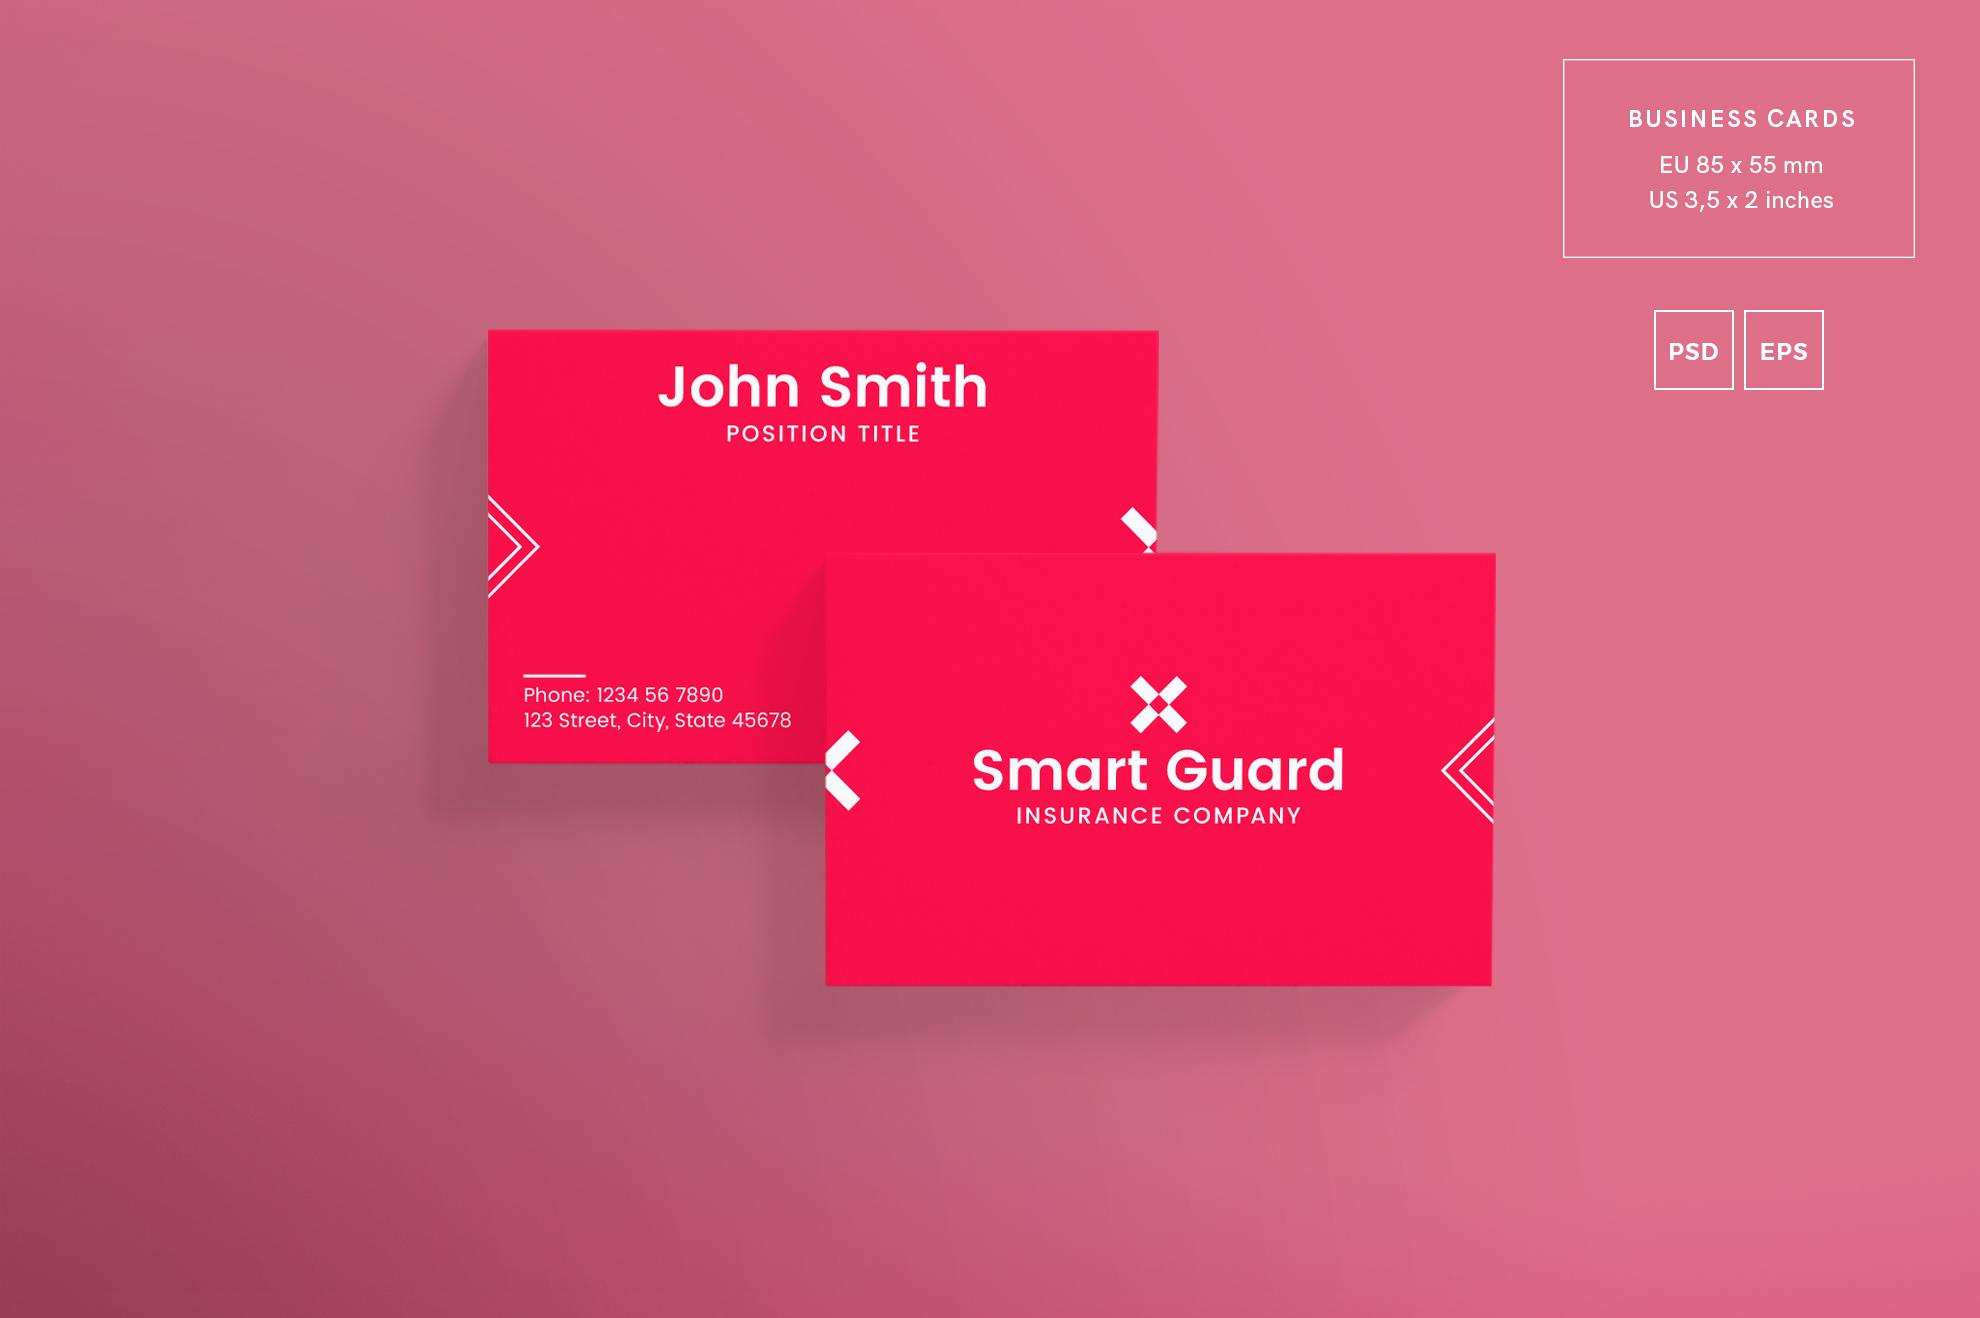 Insurance company business card design design bundles insurance company business card design templates kit example image 2 reheart Choice Image